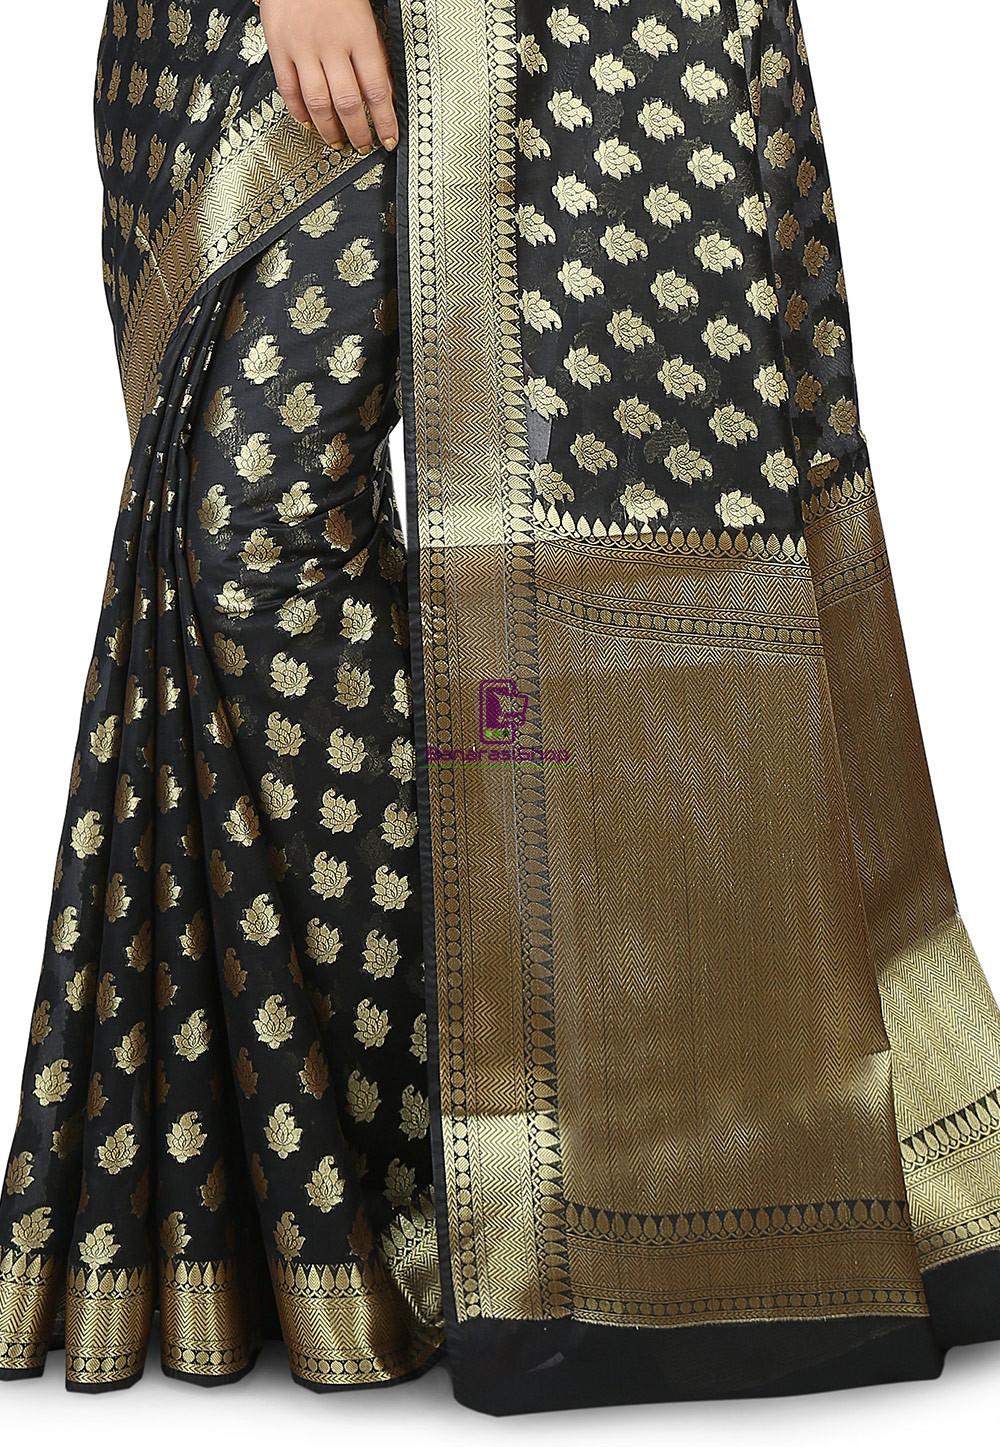 Woven Banarasi Chanderi Silk Saree in Black 3